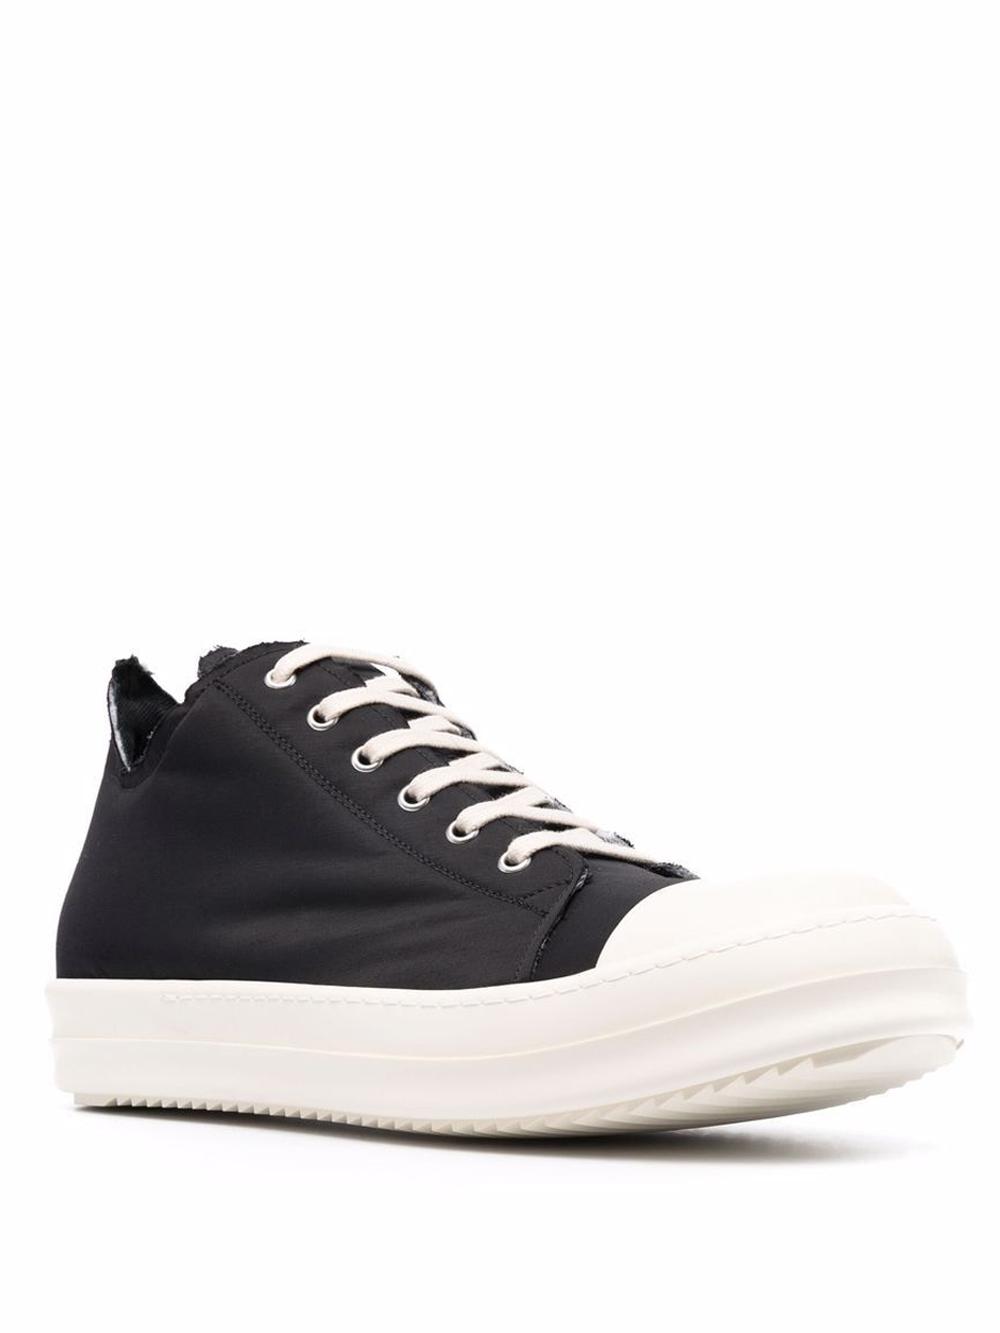 sneakers imbottite uomo nere in pelle RICK OWENS DRKSHDW | Sneakers | DU02A3802 MU911